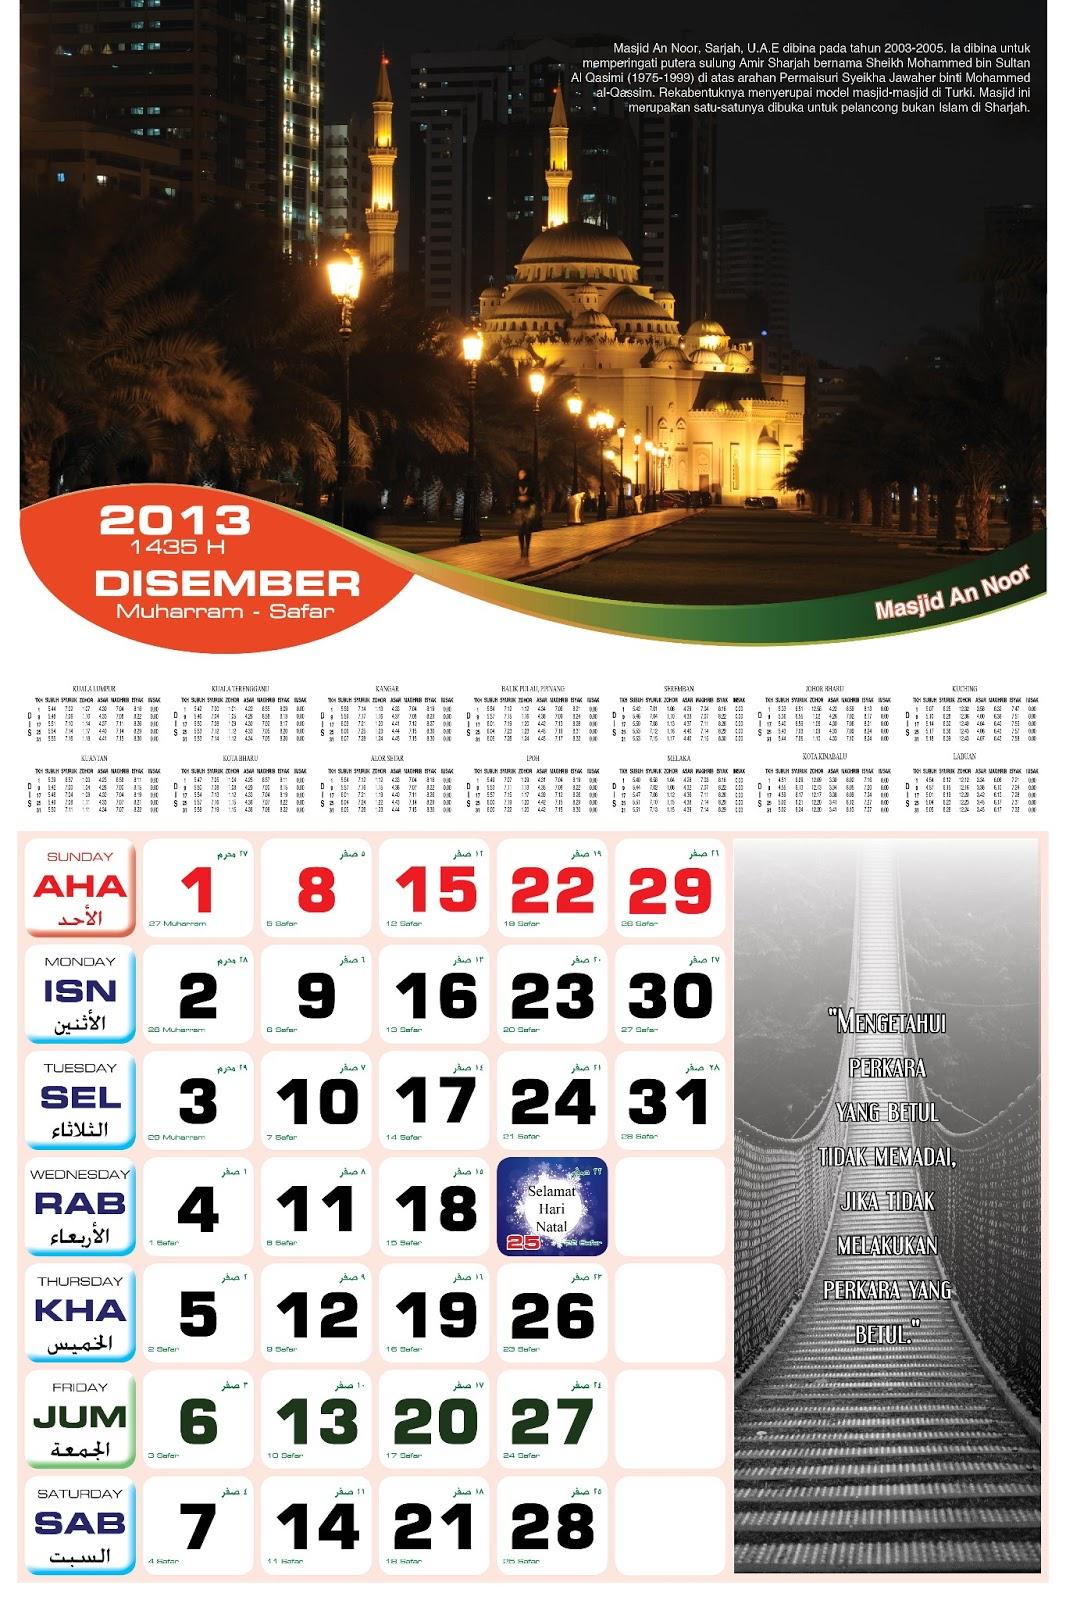 Calendar Design Html : Wport wall calendar designs